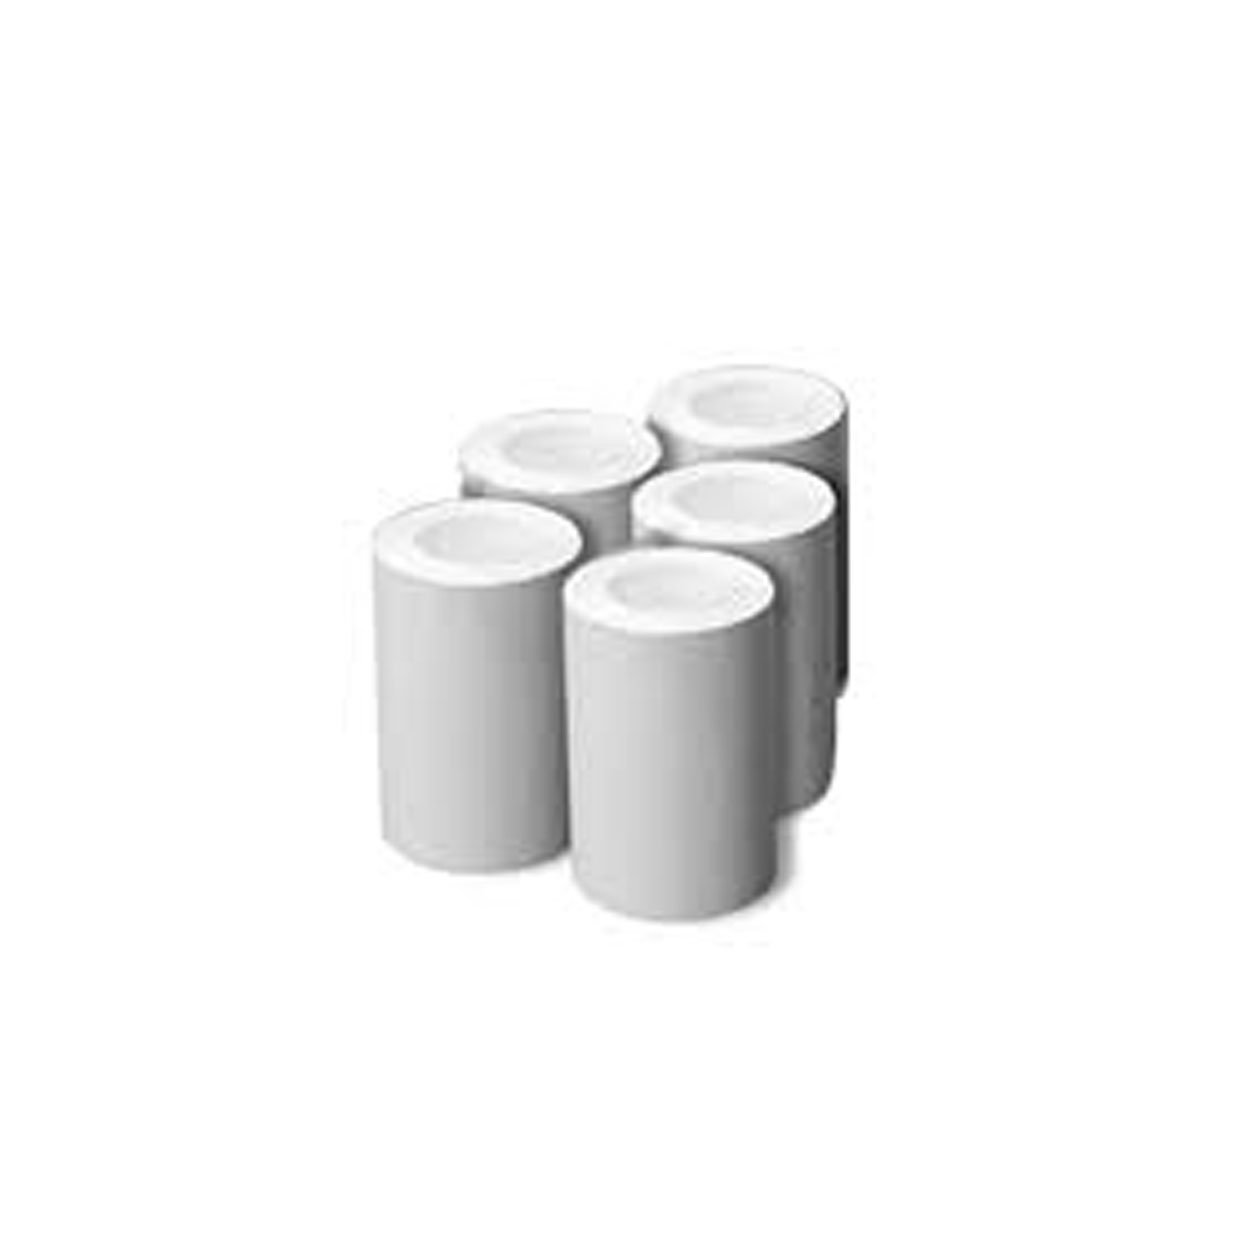 Bacharach 0024-1310 Printer Paper for IrDA Printer by Bacharach B00I93CD0A